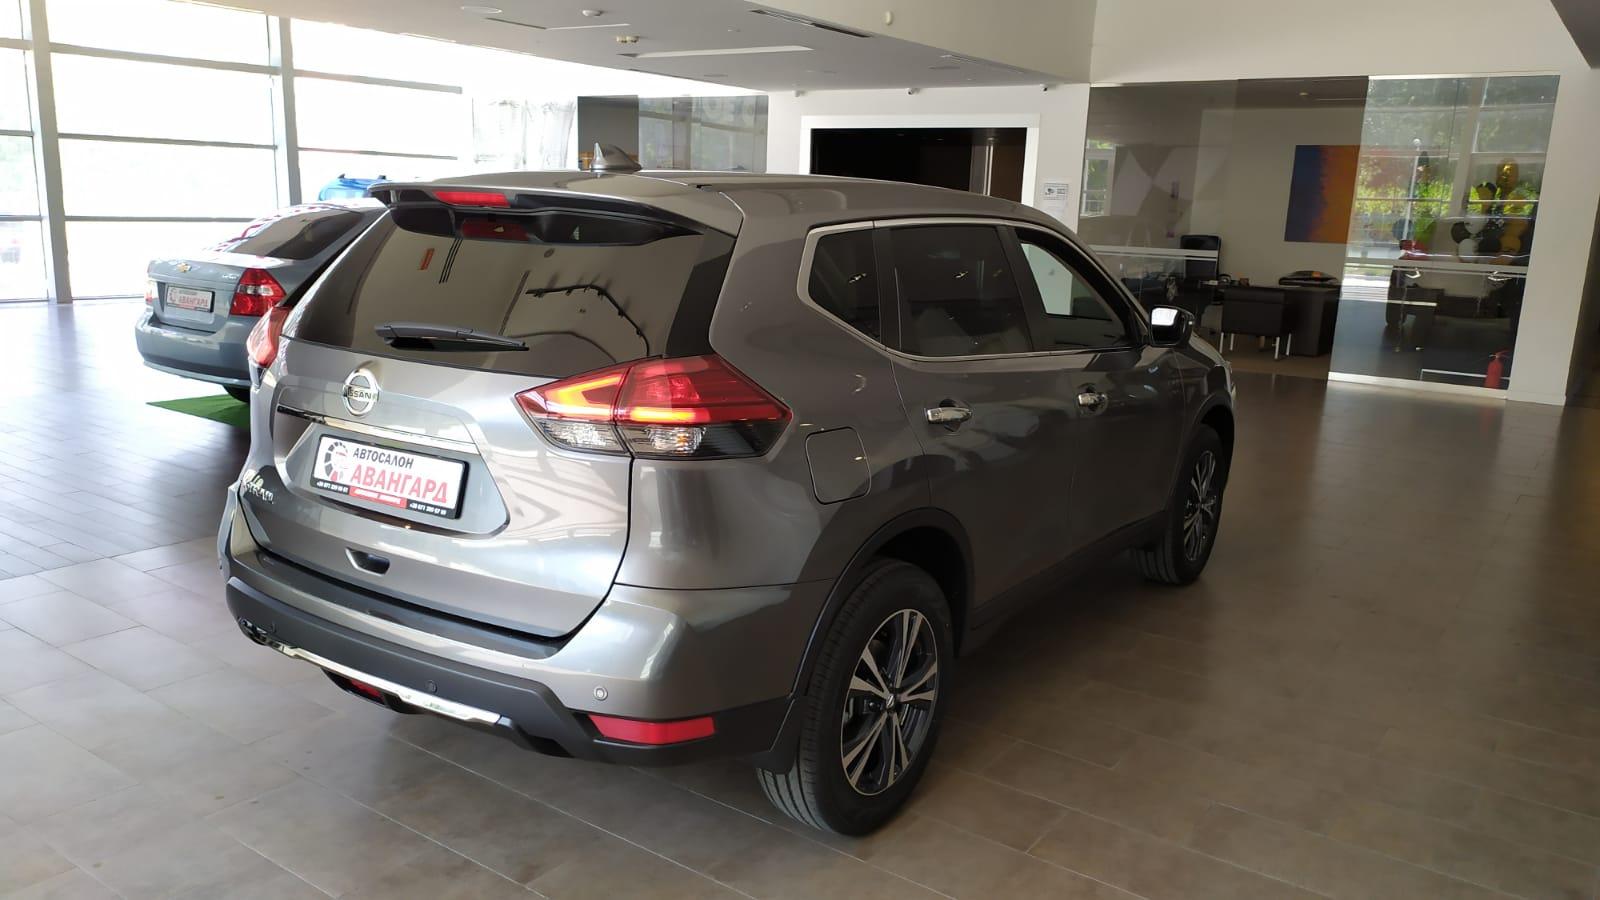 NISSAN X-TRAIL 2.0л (144 л. с.) 4WD CVT LE+. Серый. 2021